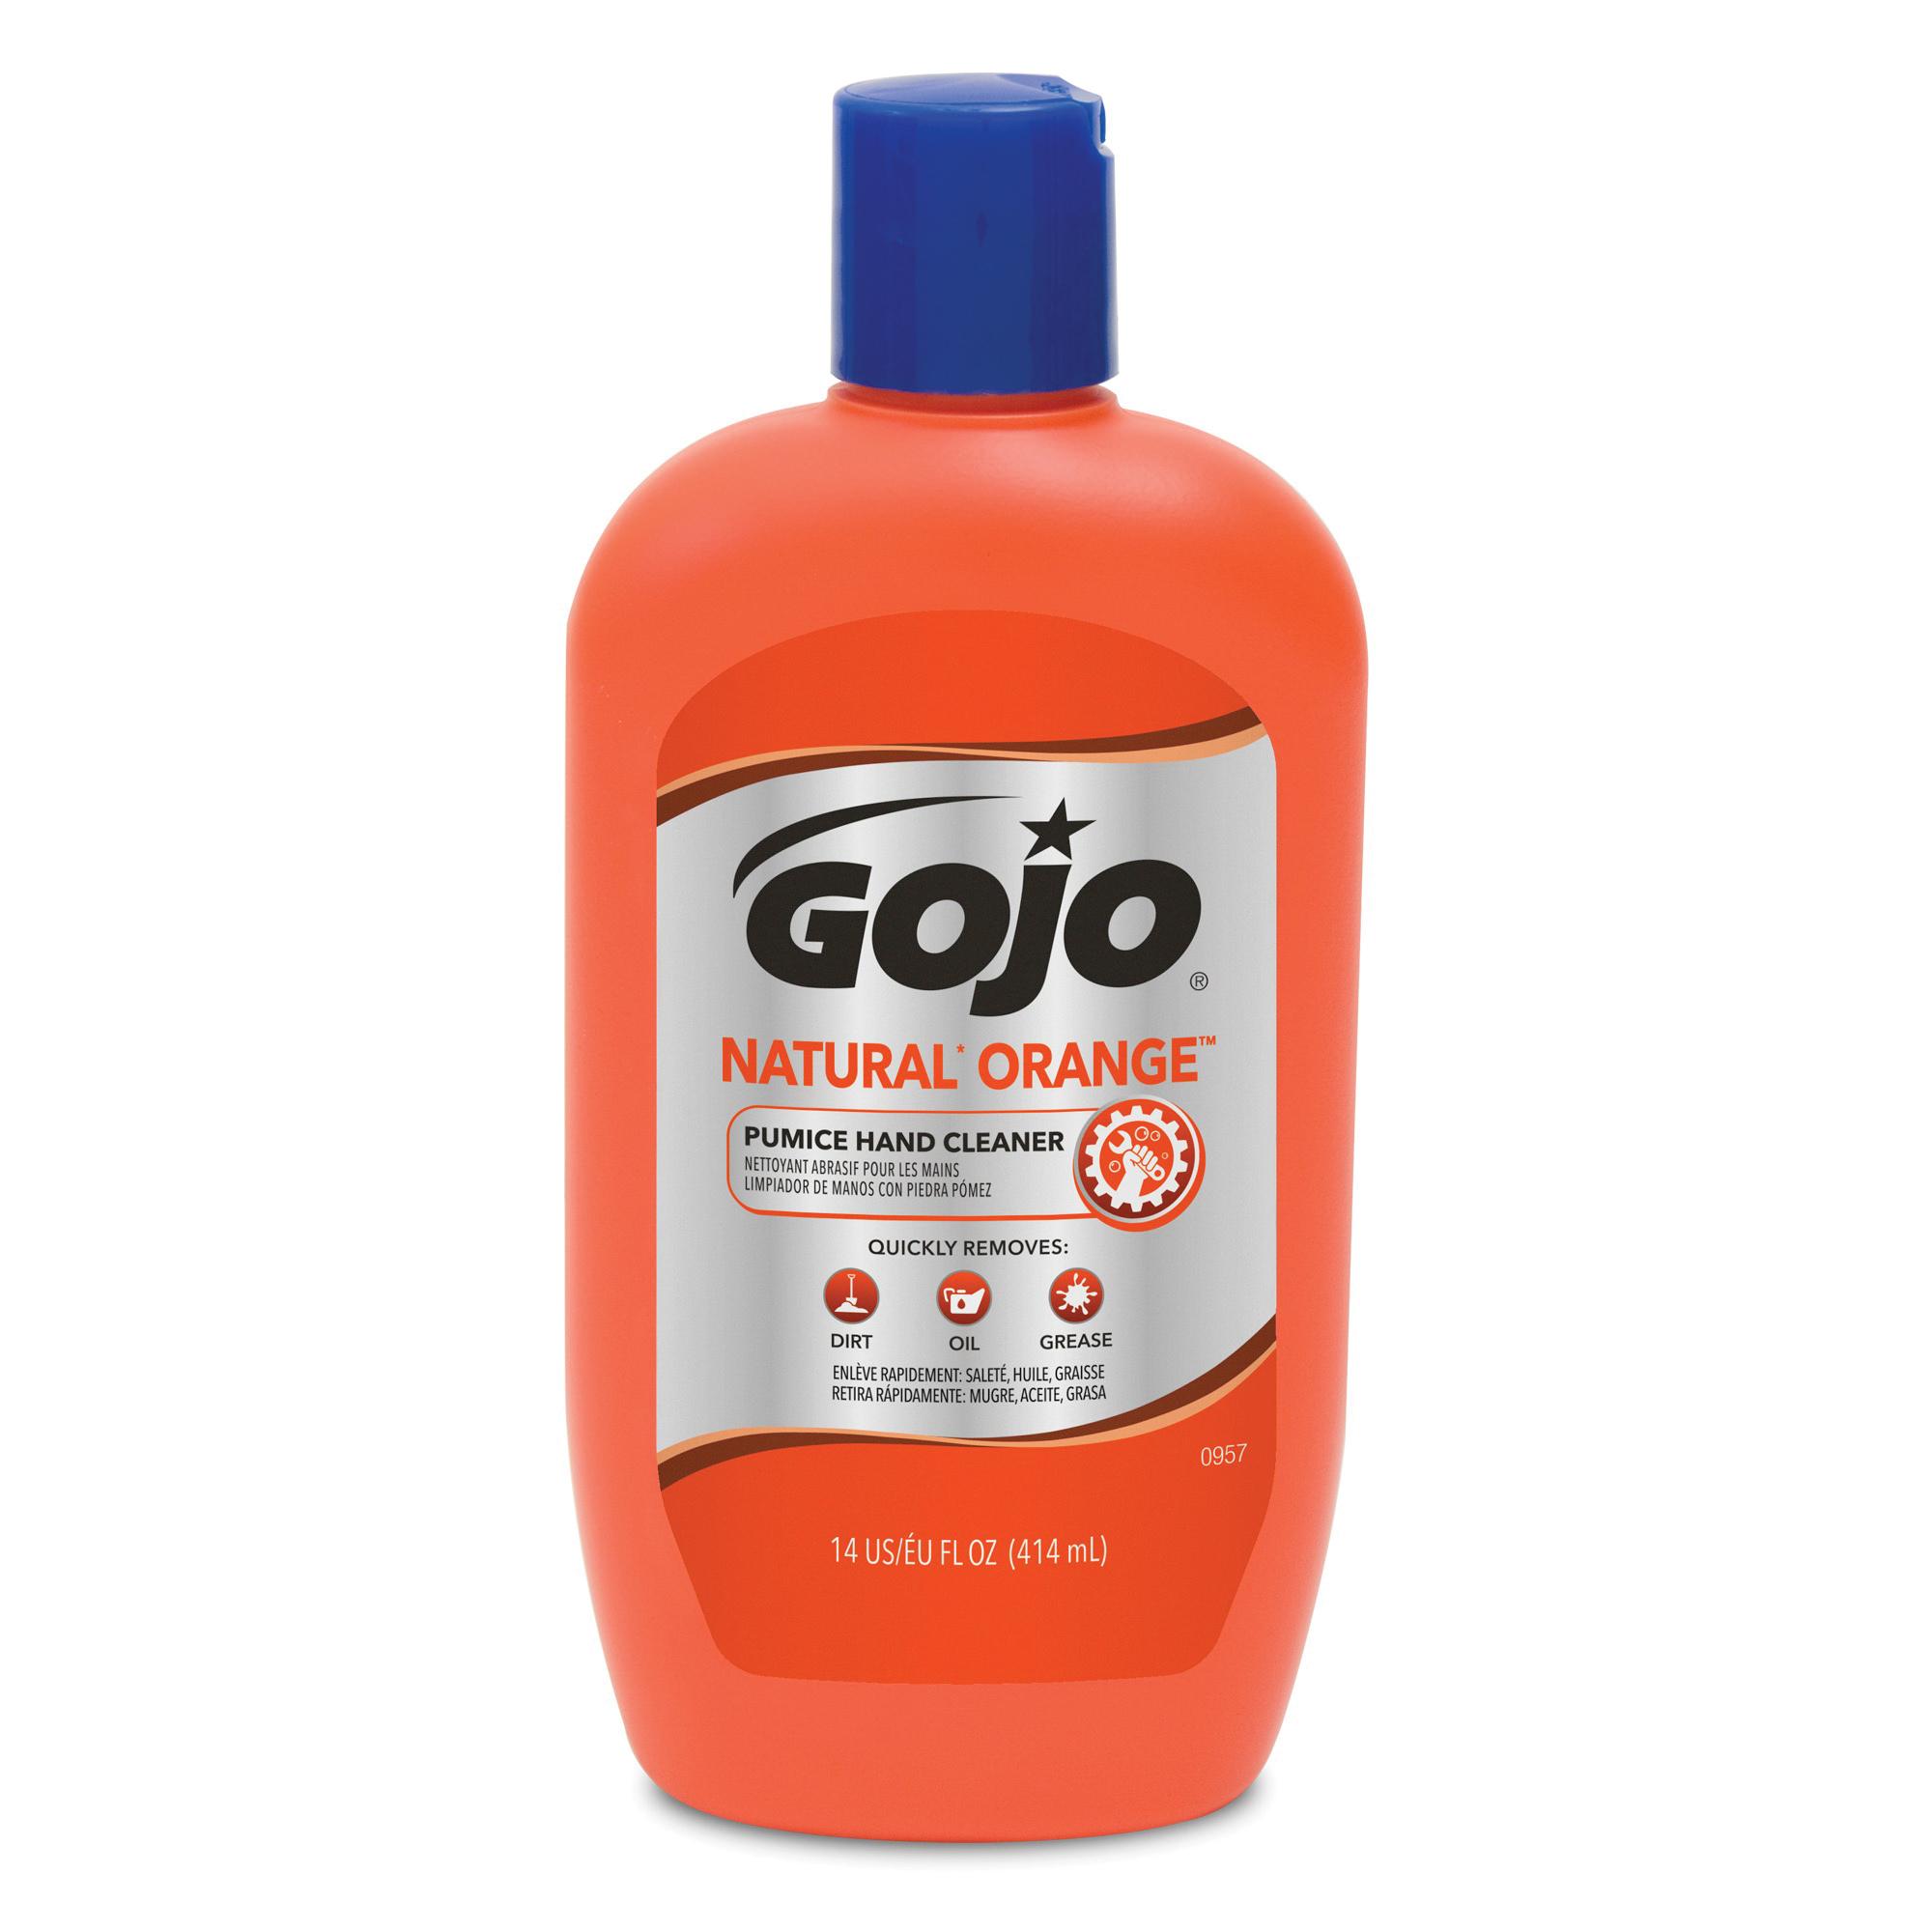 GOJO® 0955-04 NATURAL ORANGE™ Pumice Hand Cleaner, 1 gal, Pump Bottle, Liquid, Citrus, White